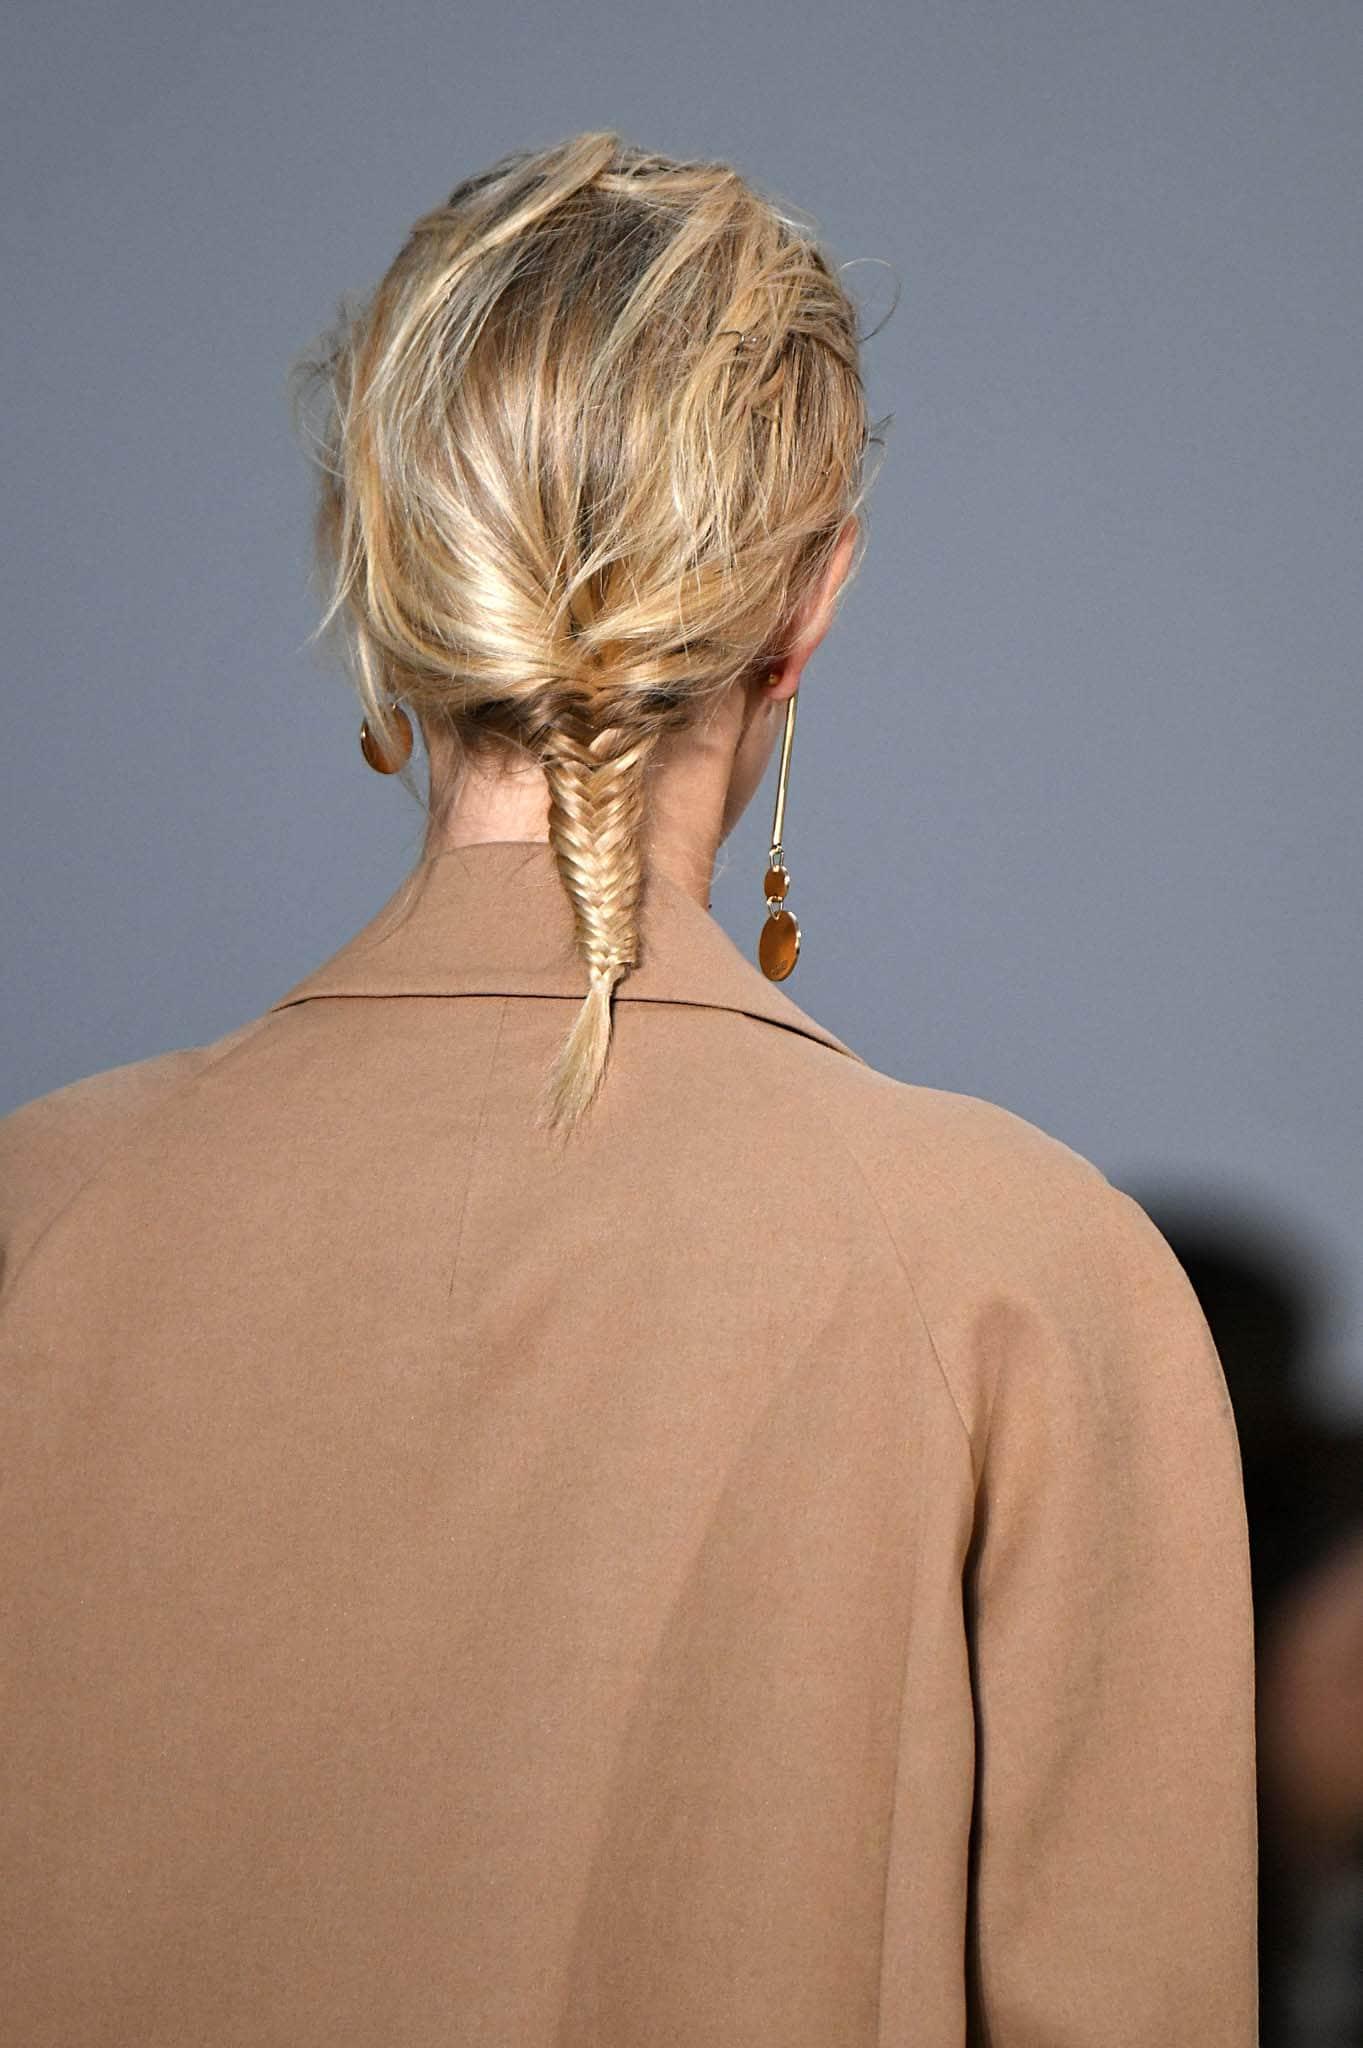 Peinado con trenza espiga